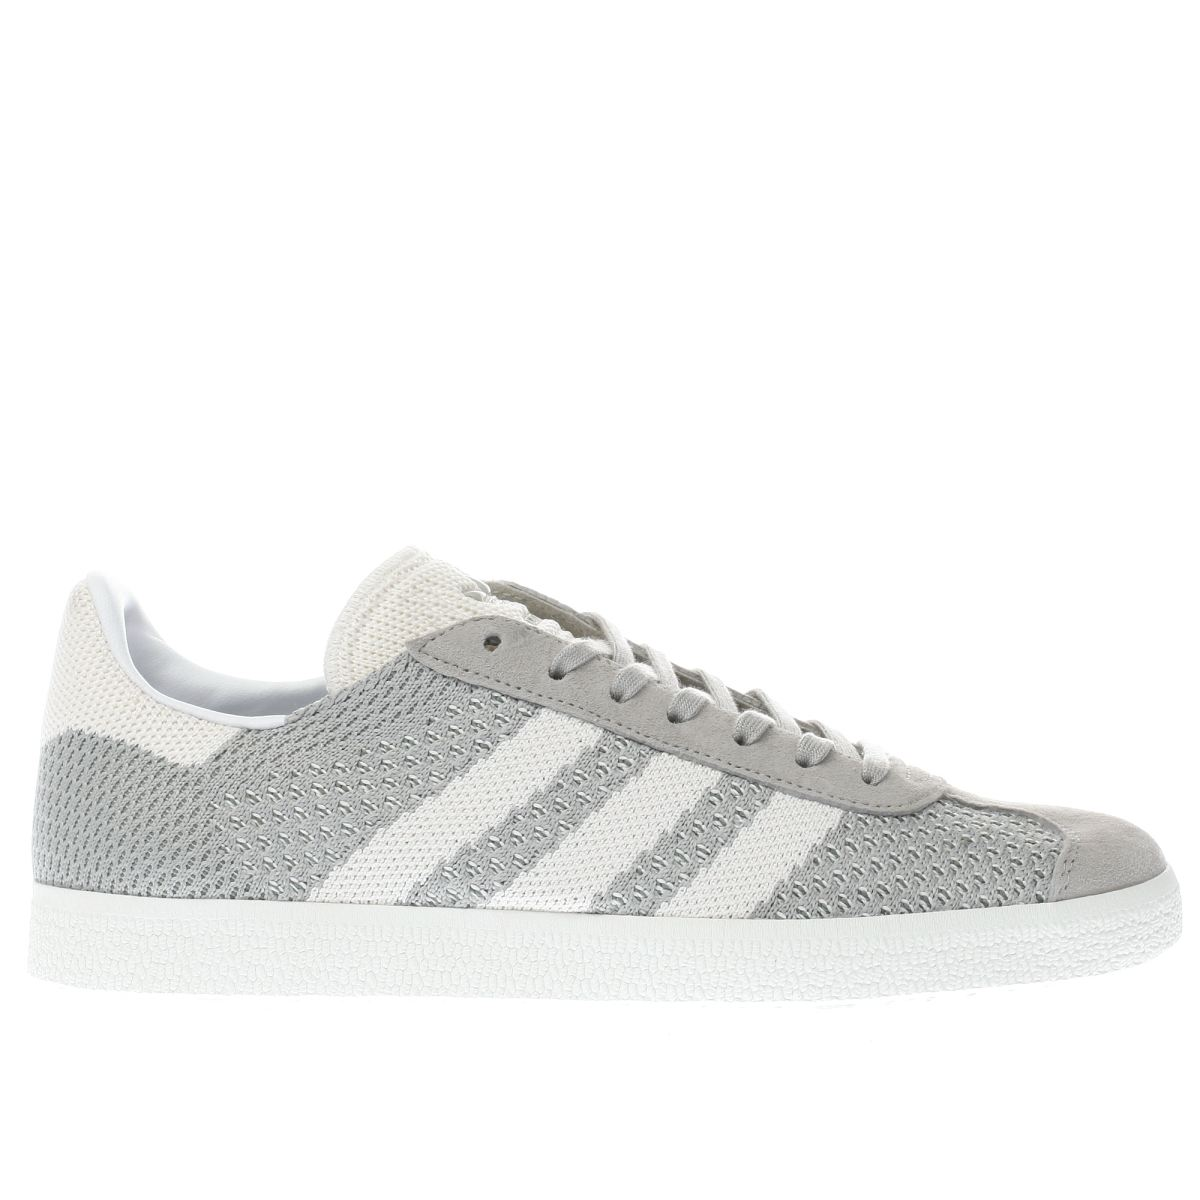 adidas light grey gazelle prime knit trainers